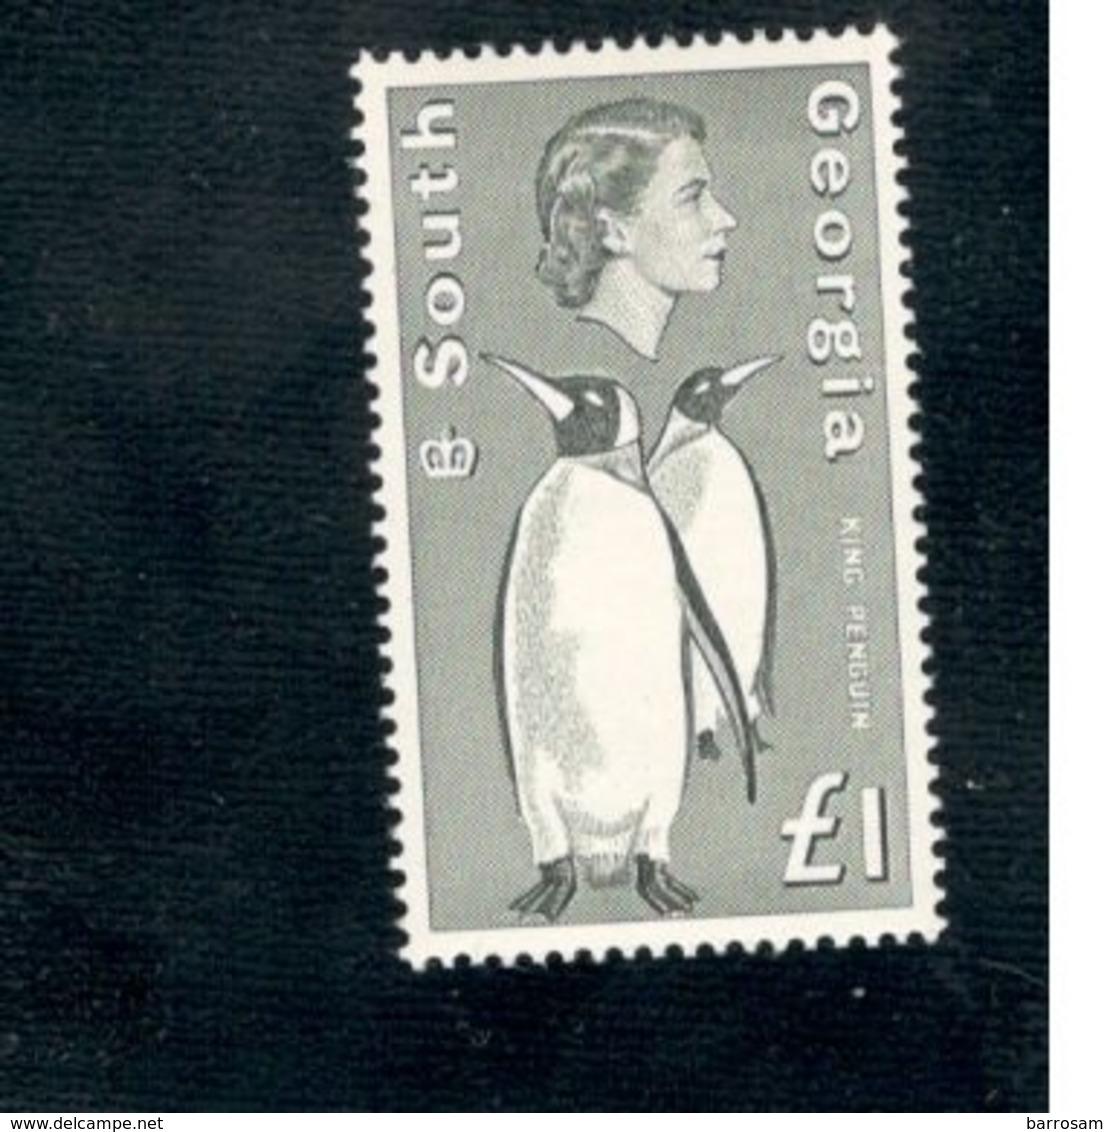 FALKLAND:SOUTH GEORGIA 1969 Michel24mnh** Cat.Value$22+ - Falkland Islands